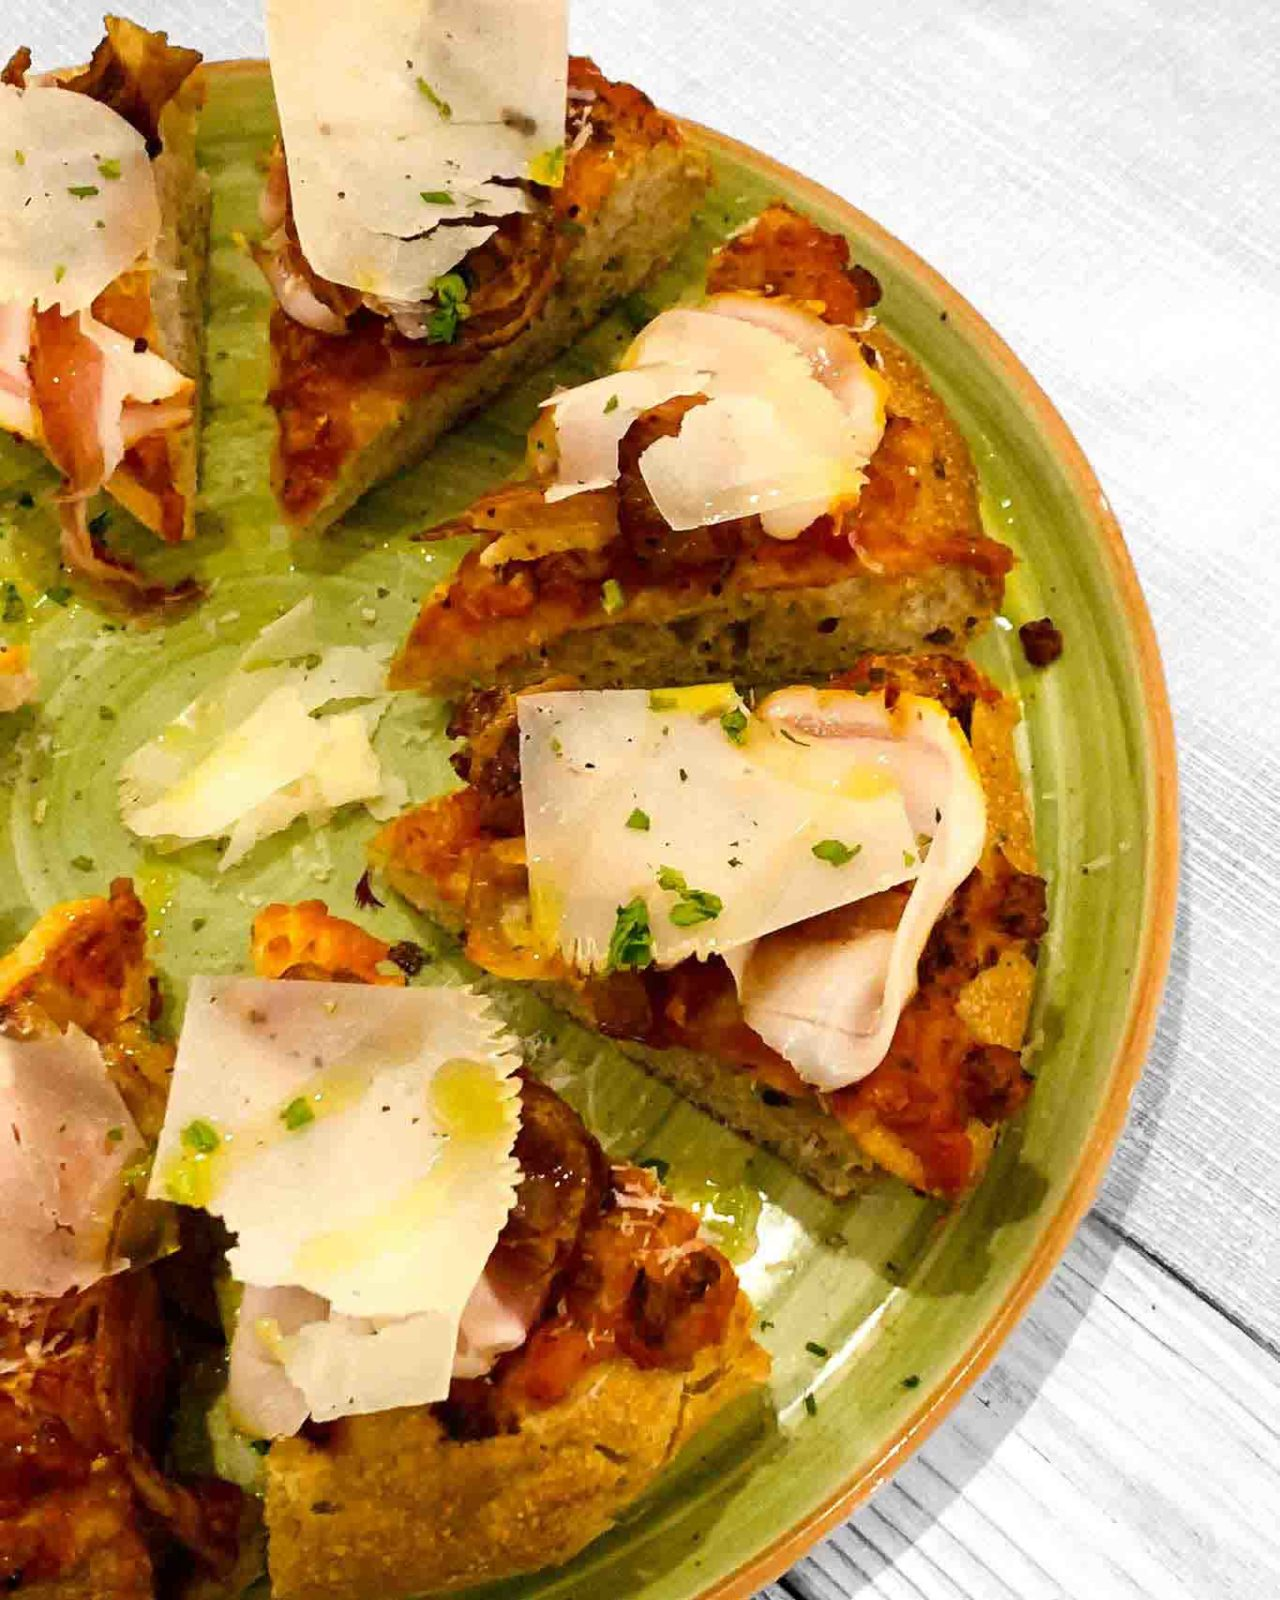 Giangi Pizza e Ricerca pizzeria Abruzzo amatriciana